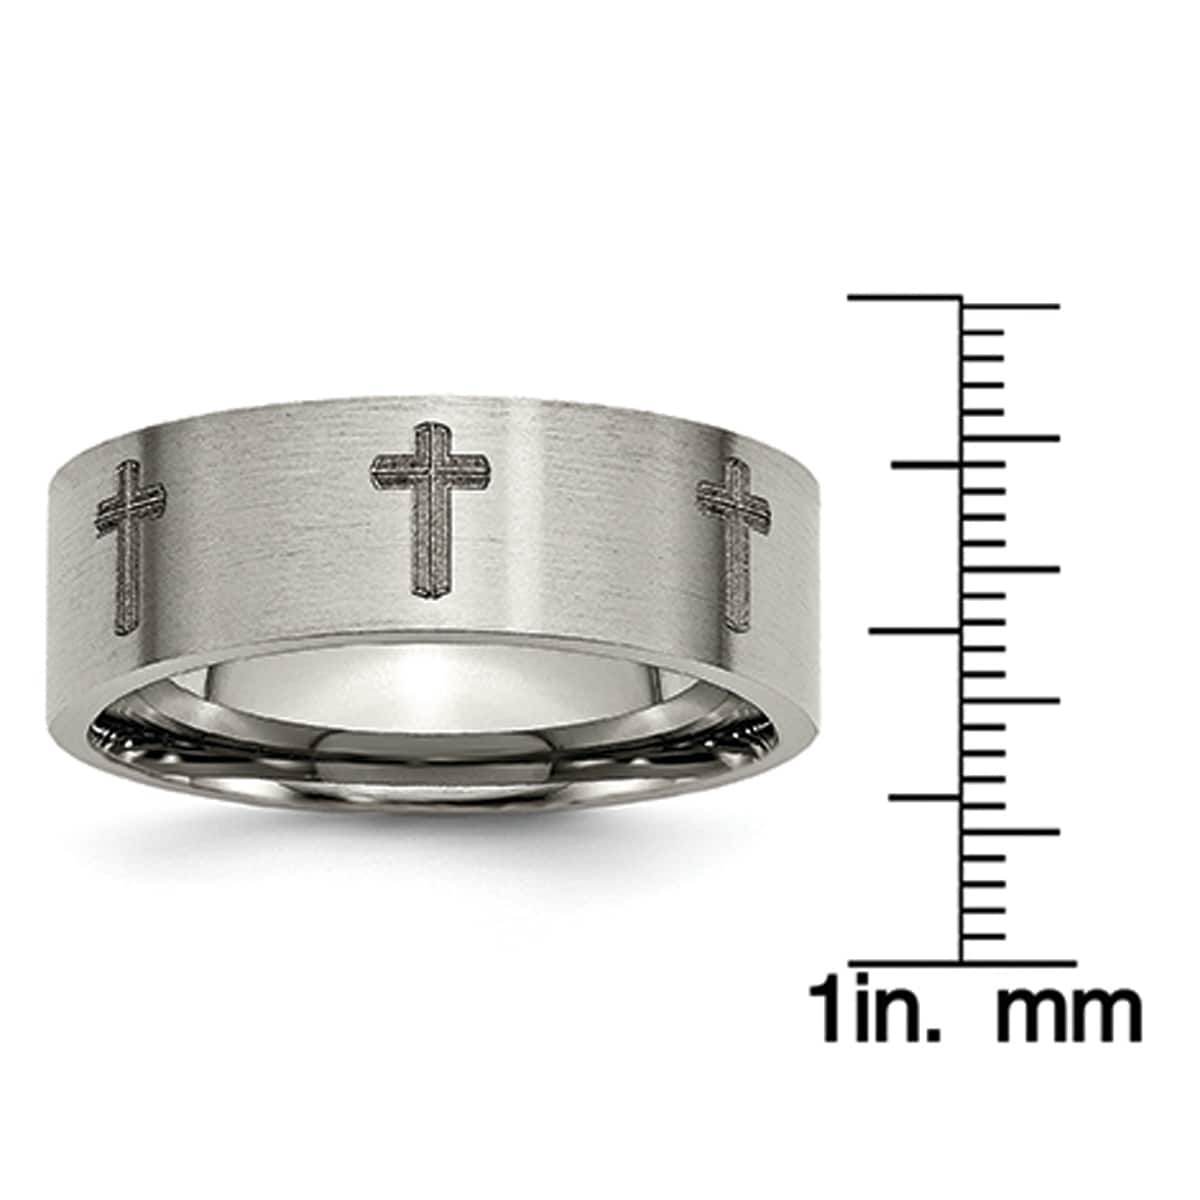 Wedding Bands Religious Bands Titanium 8mm Laser Design Brushed Band Size 9.5